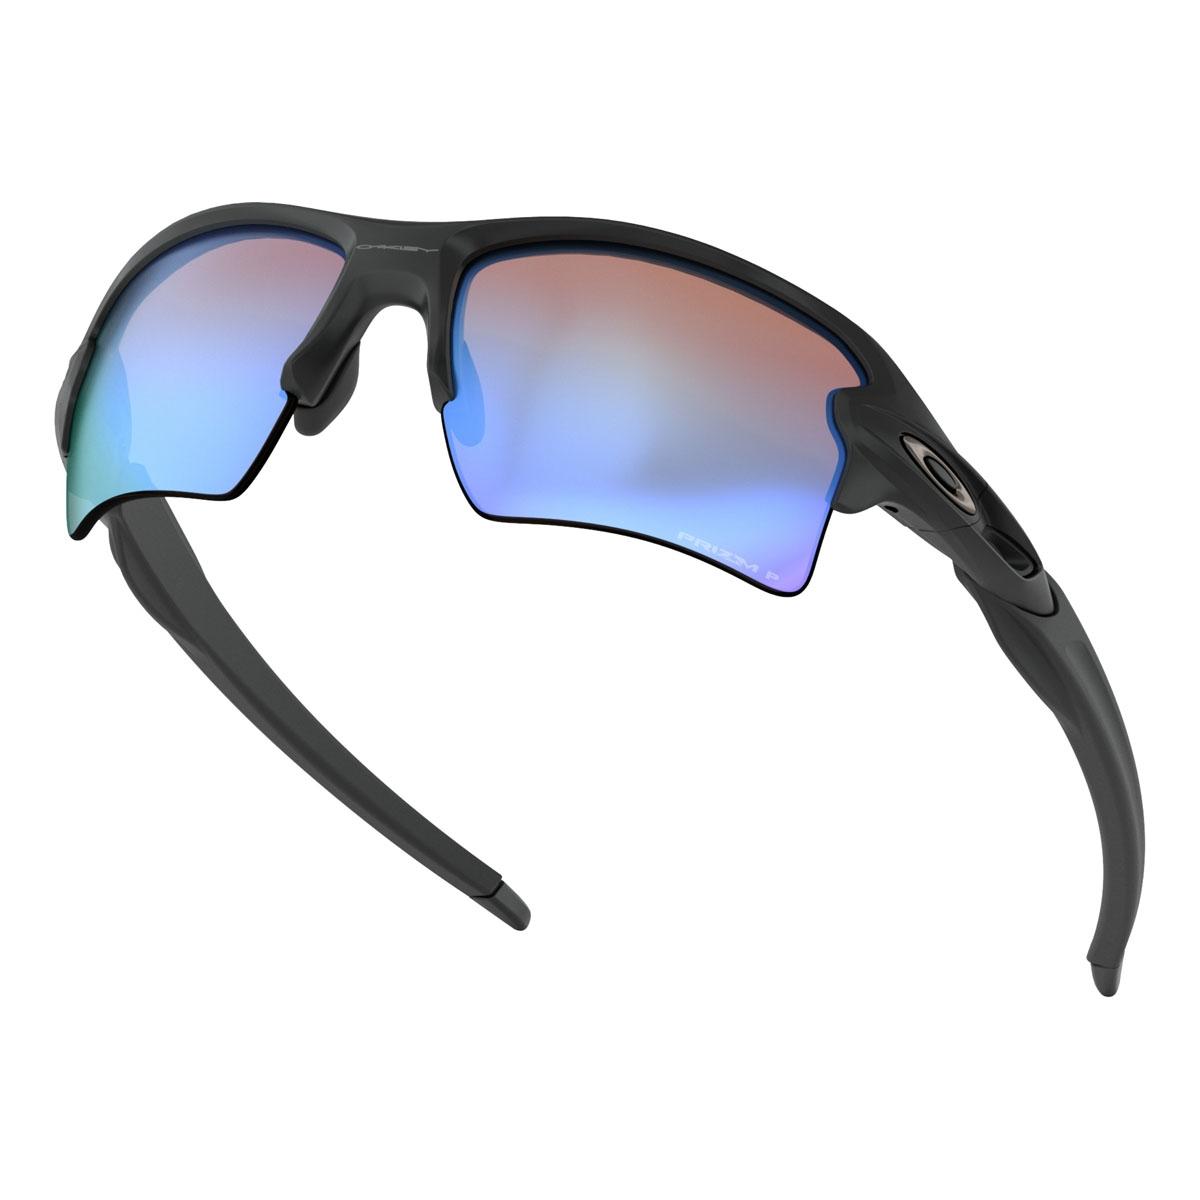 b1fdb50e3b8d ... Image of Oakley Flak 2.0 XL Prizm Deep Water Polarized Sunglasses -  Matte Black Frame  ...